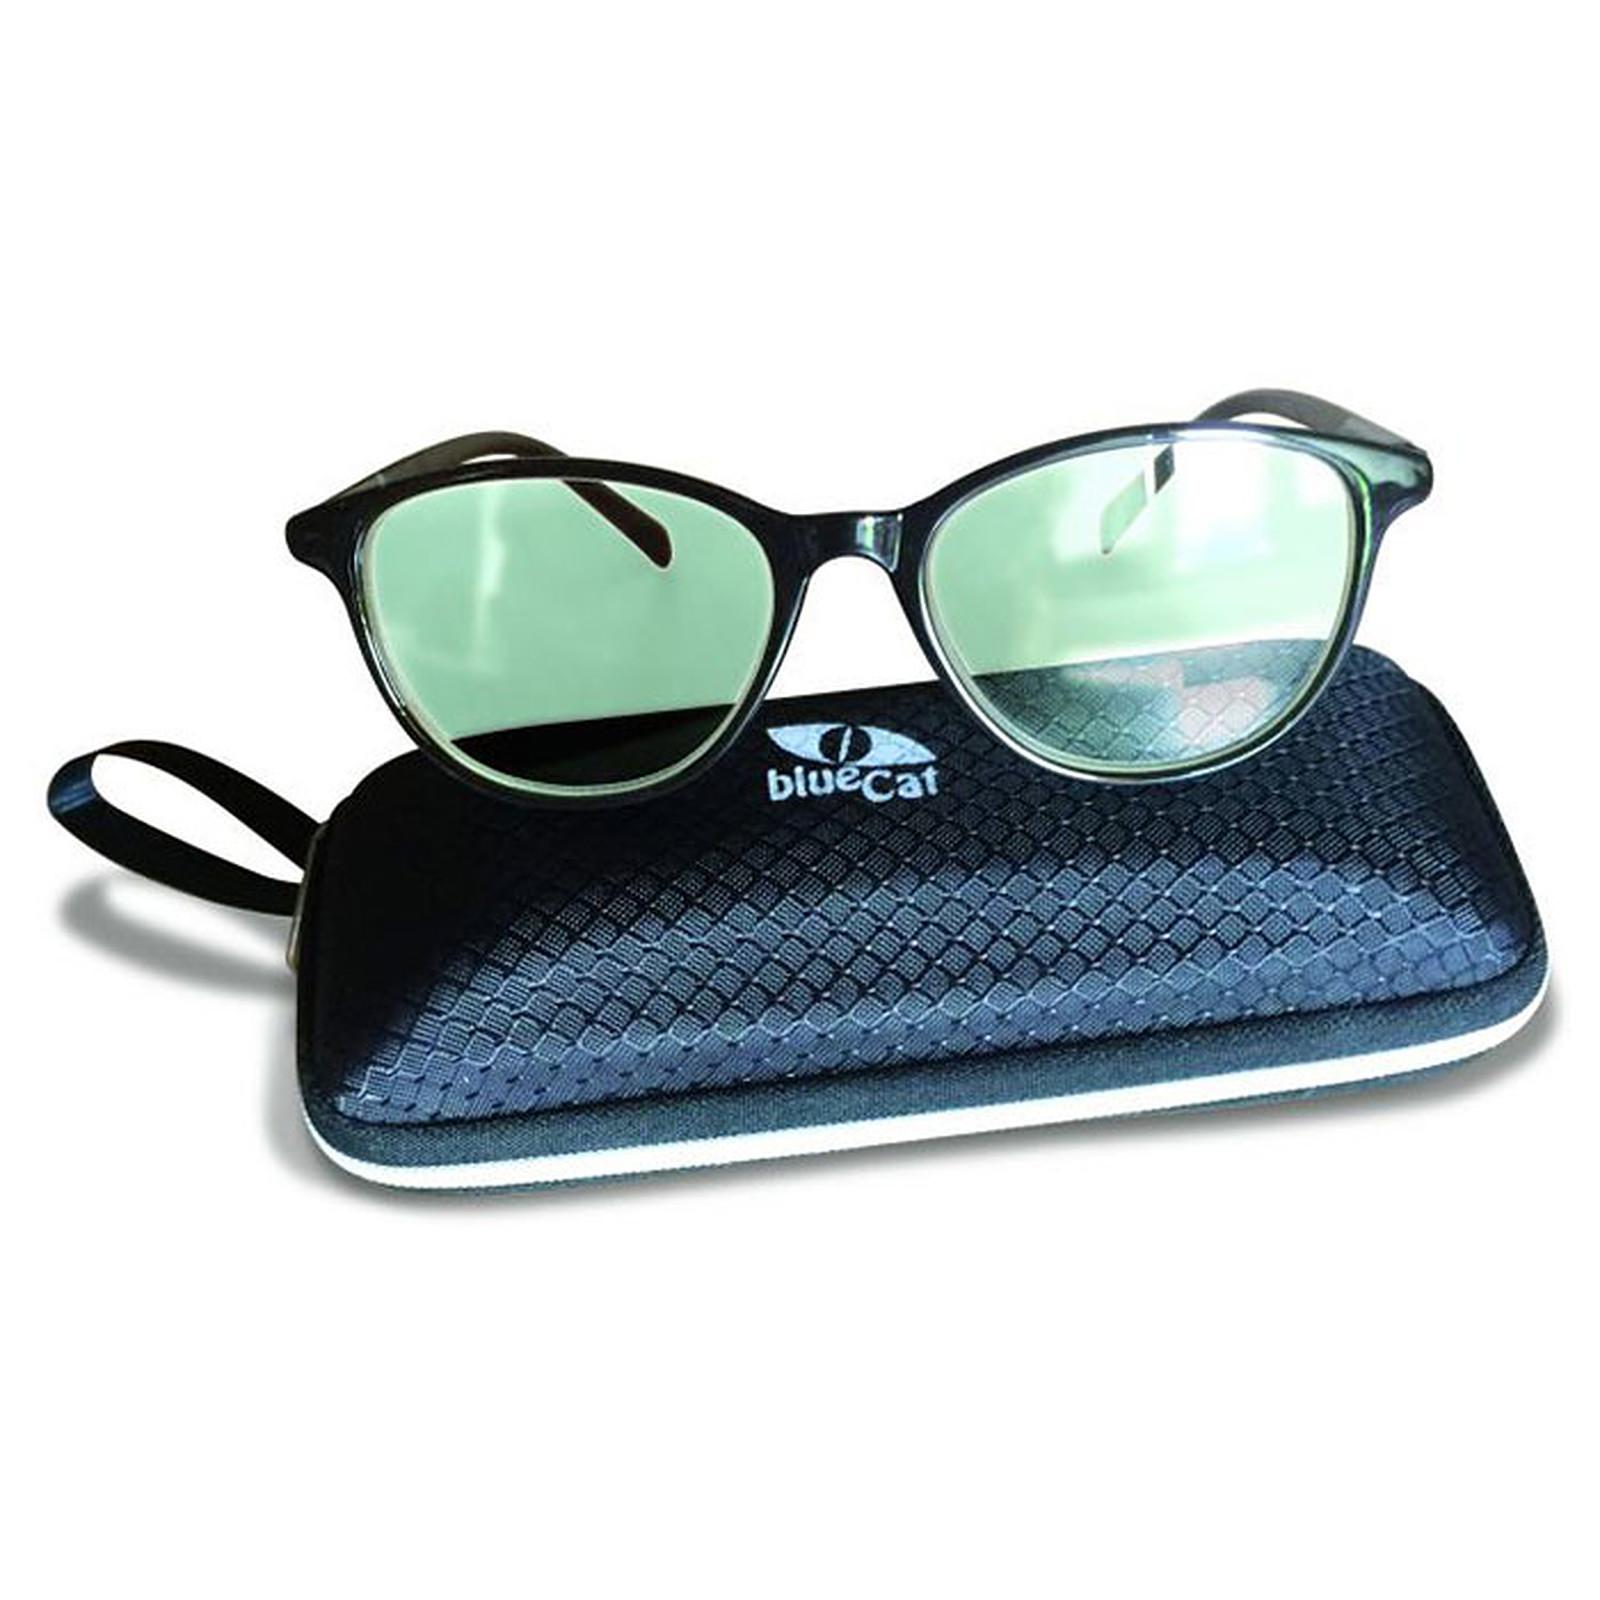 BlueCat Screen Glasses LBCSF1